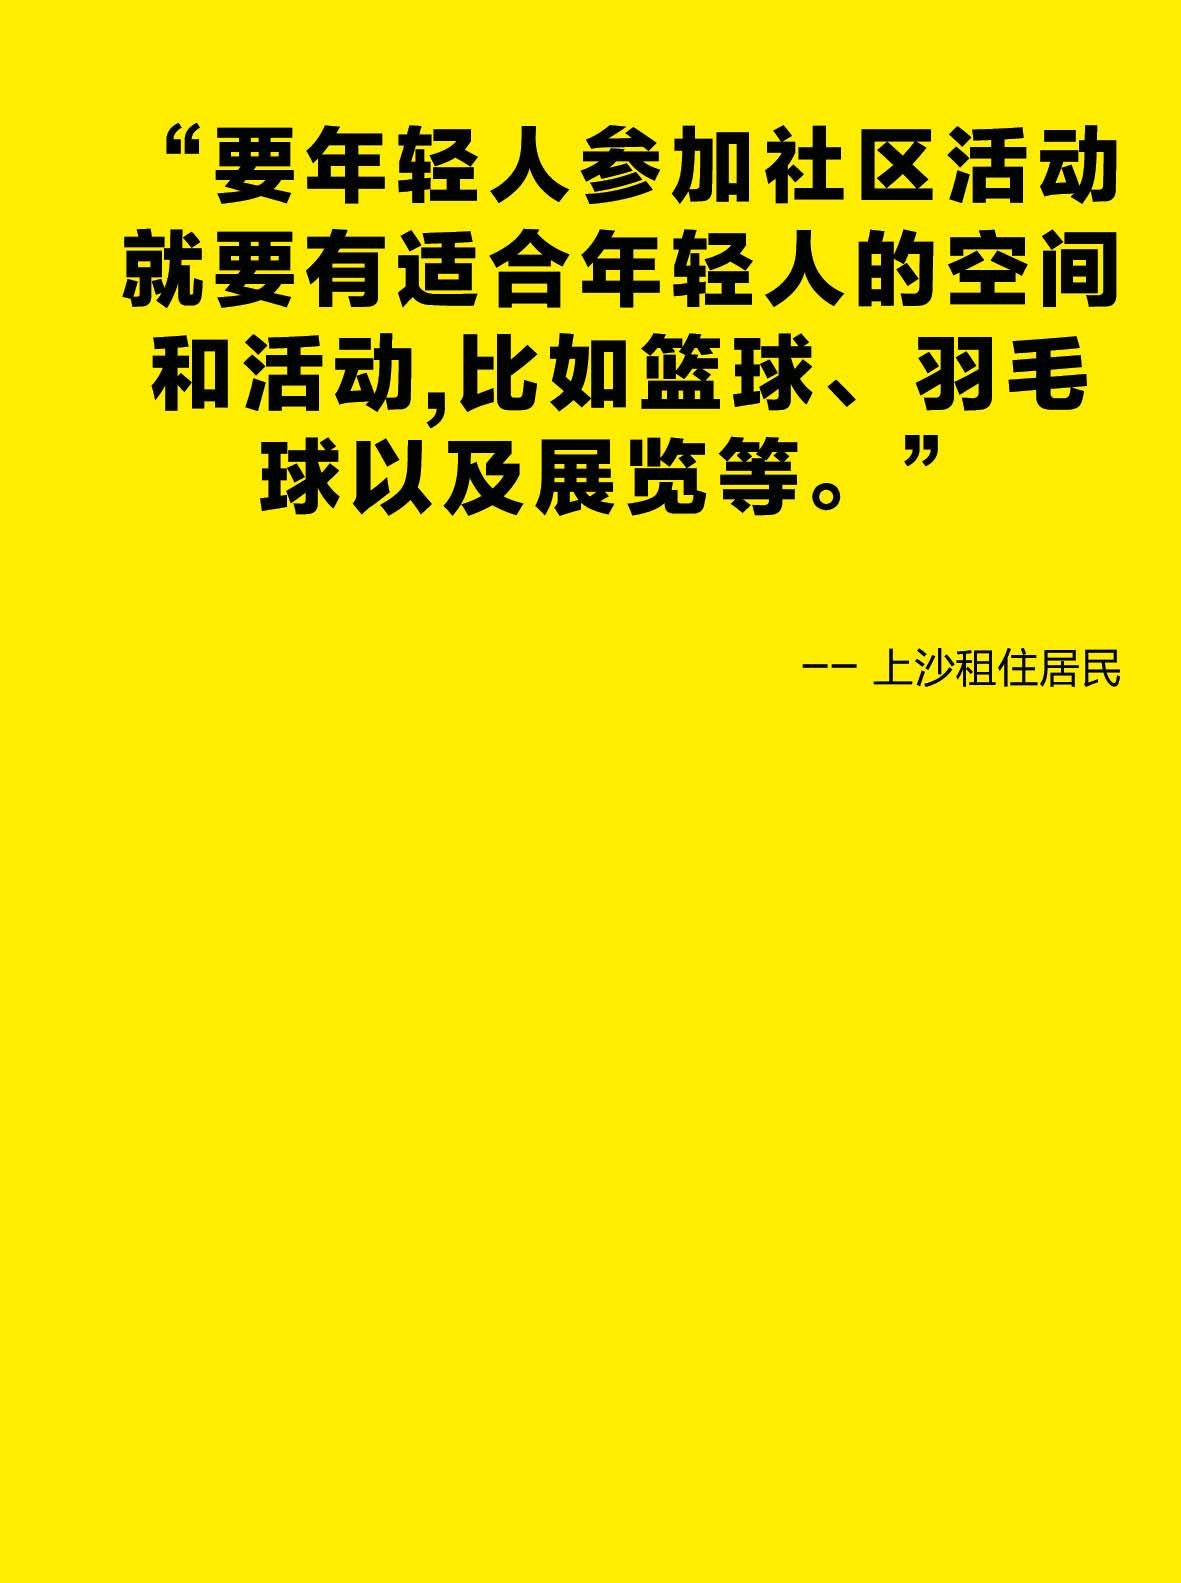 20180106_Shangsha Quotes test0324.jpg